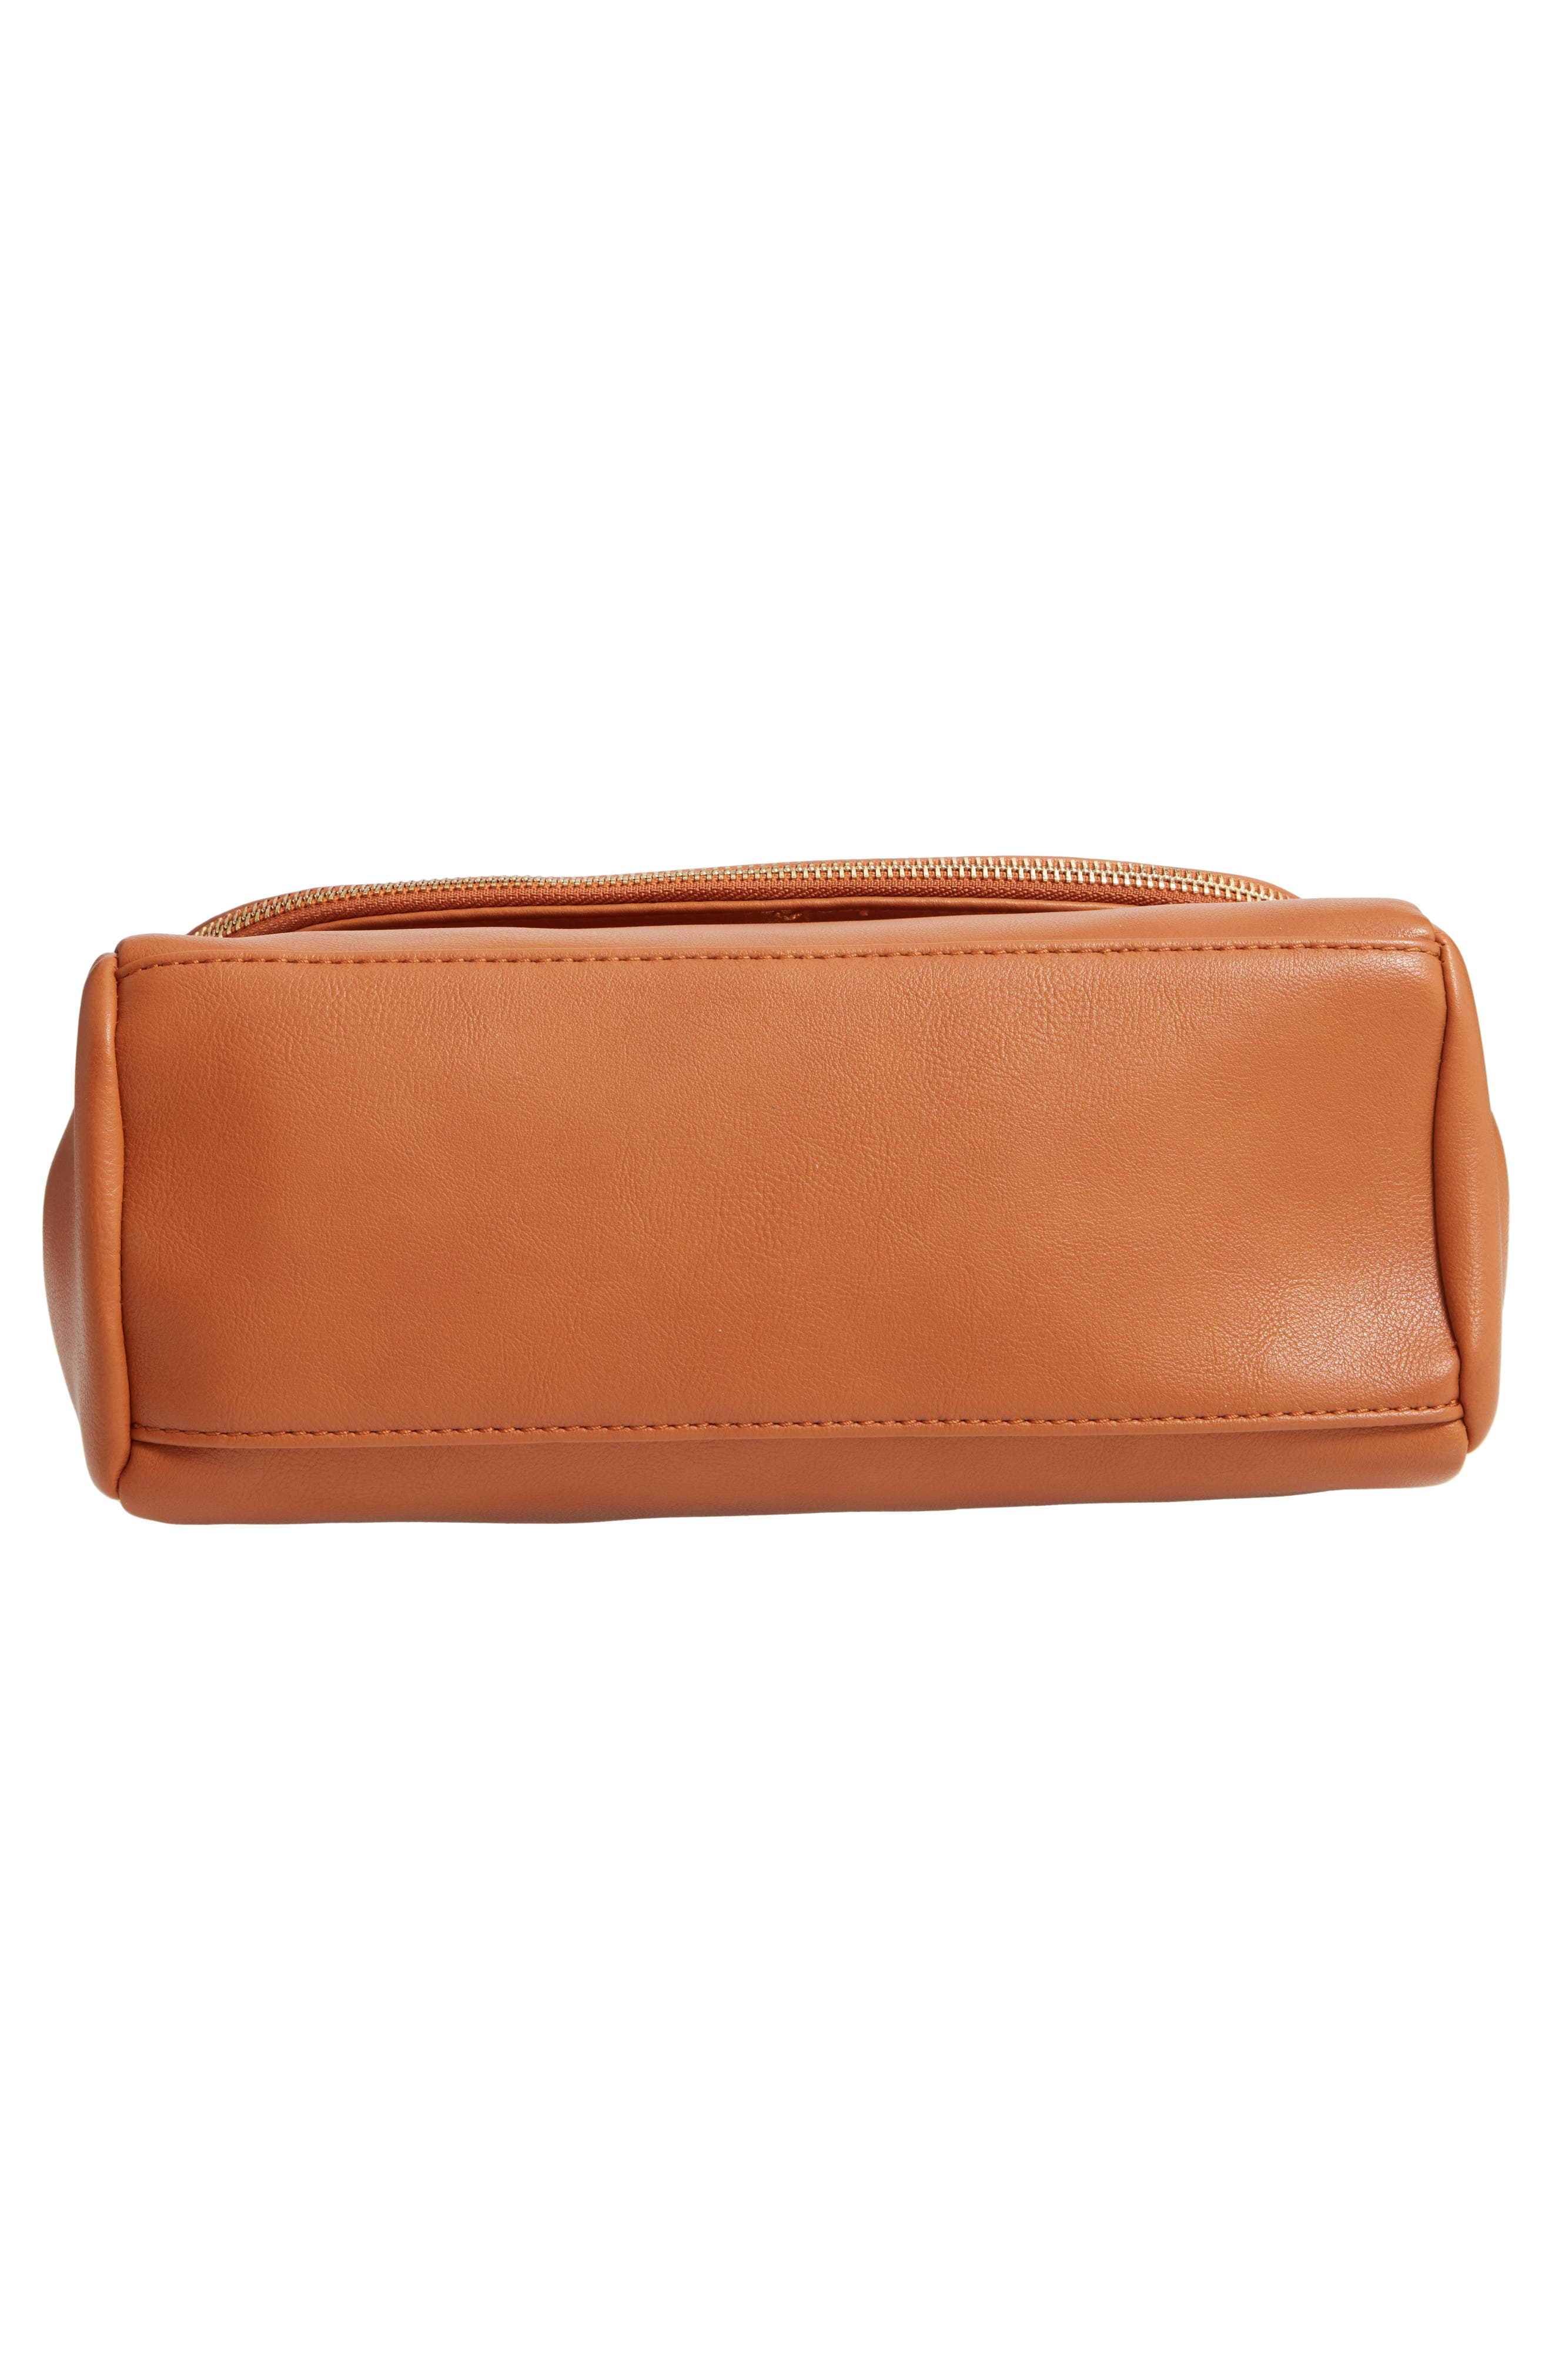 SOLE SOCIETY, Rubie Faux Leather Crossbody Bag, Alternate thumbnail 7, color, COGNAC